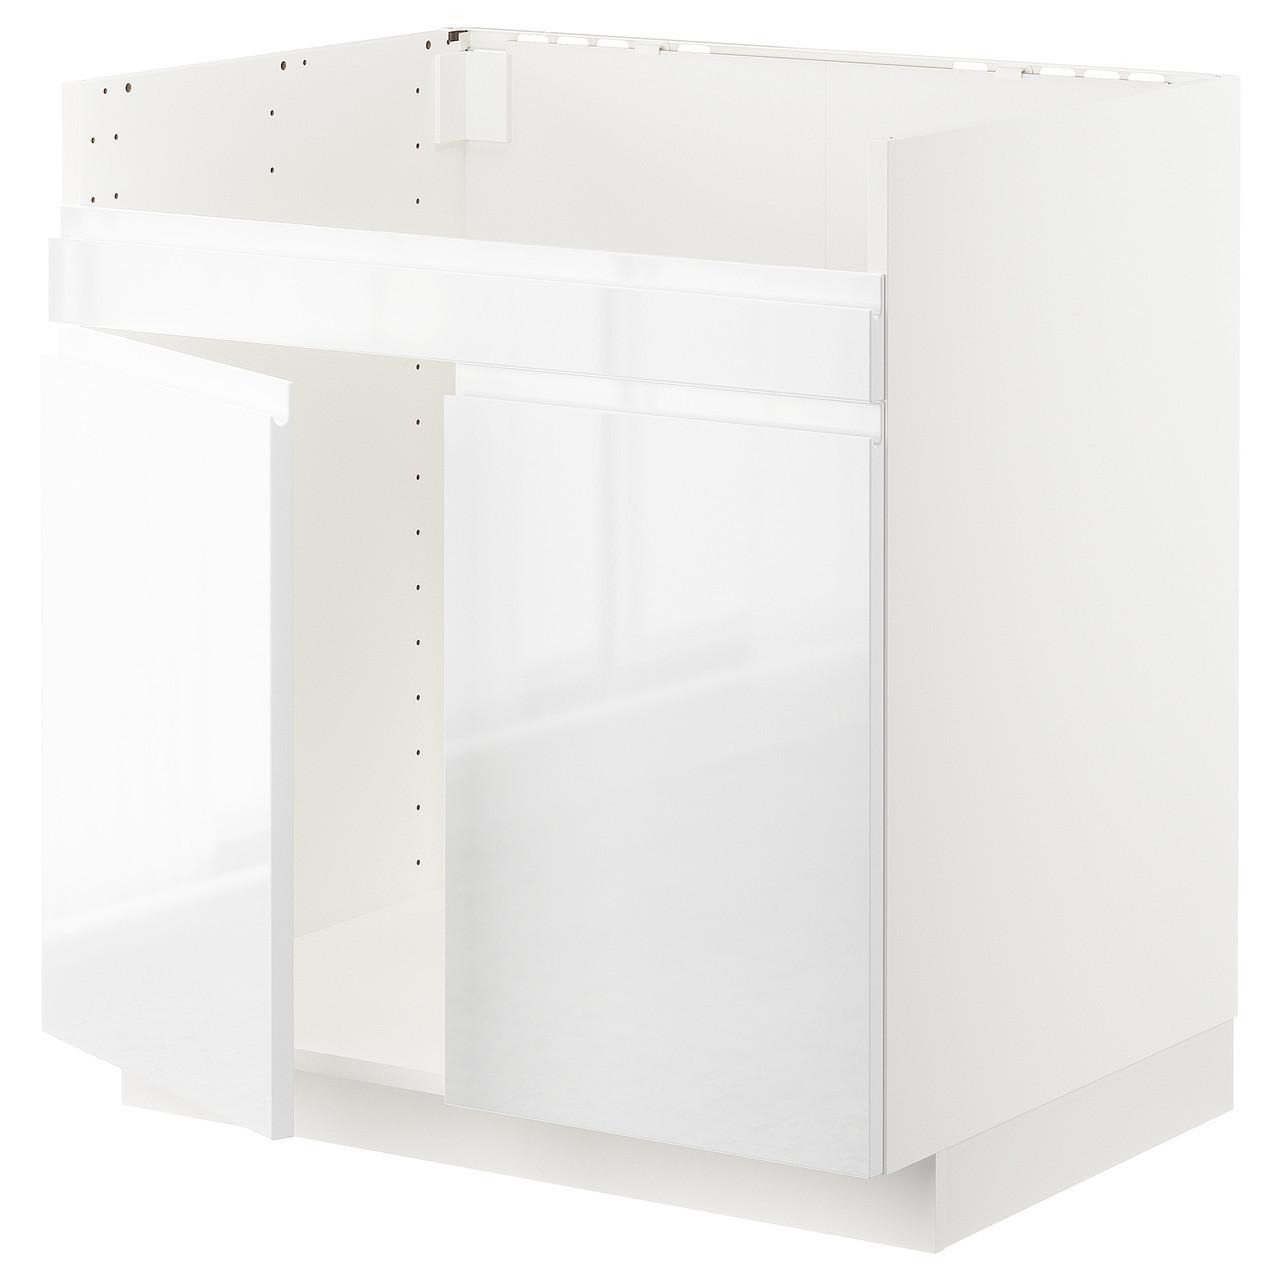 Тумба под раковину IKEA METOD HAVSEN 80x60 см Voxtorp белая глянцевая 792.803.66